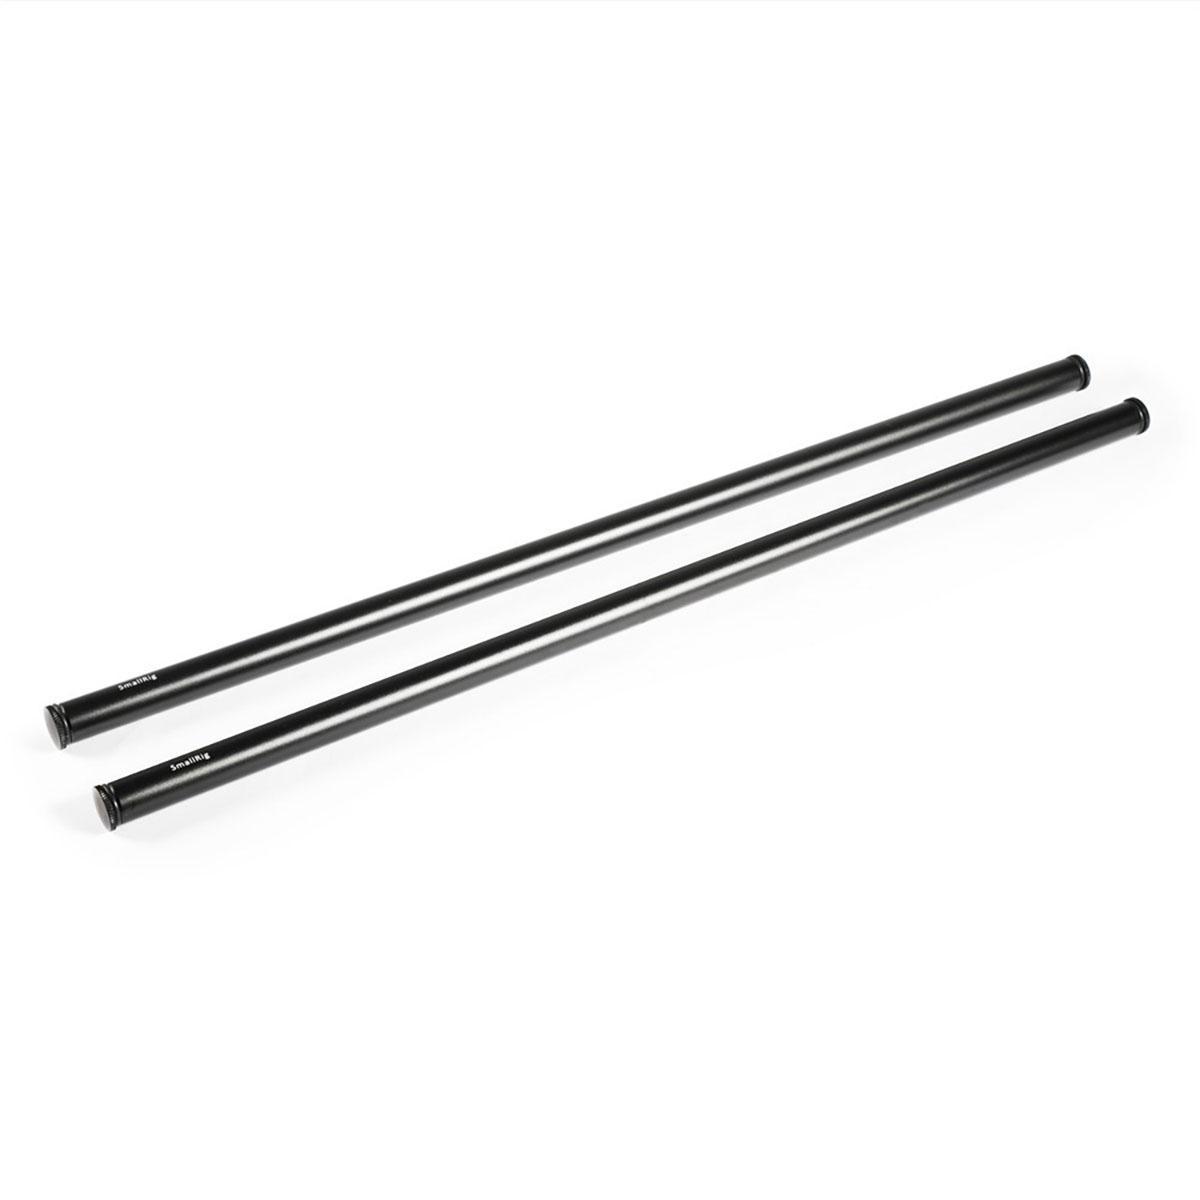 "SmallRig 15 mm Rod M12 45 cm 18"" (2 Stück) 1055"